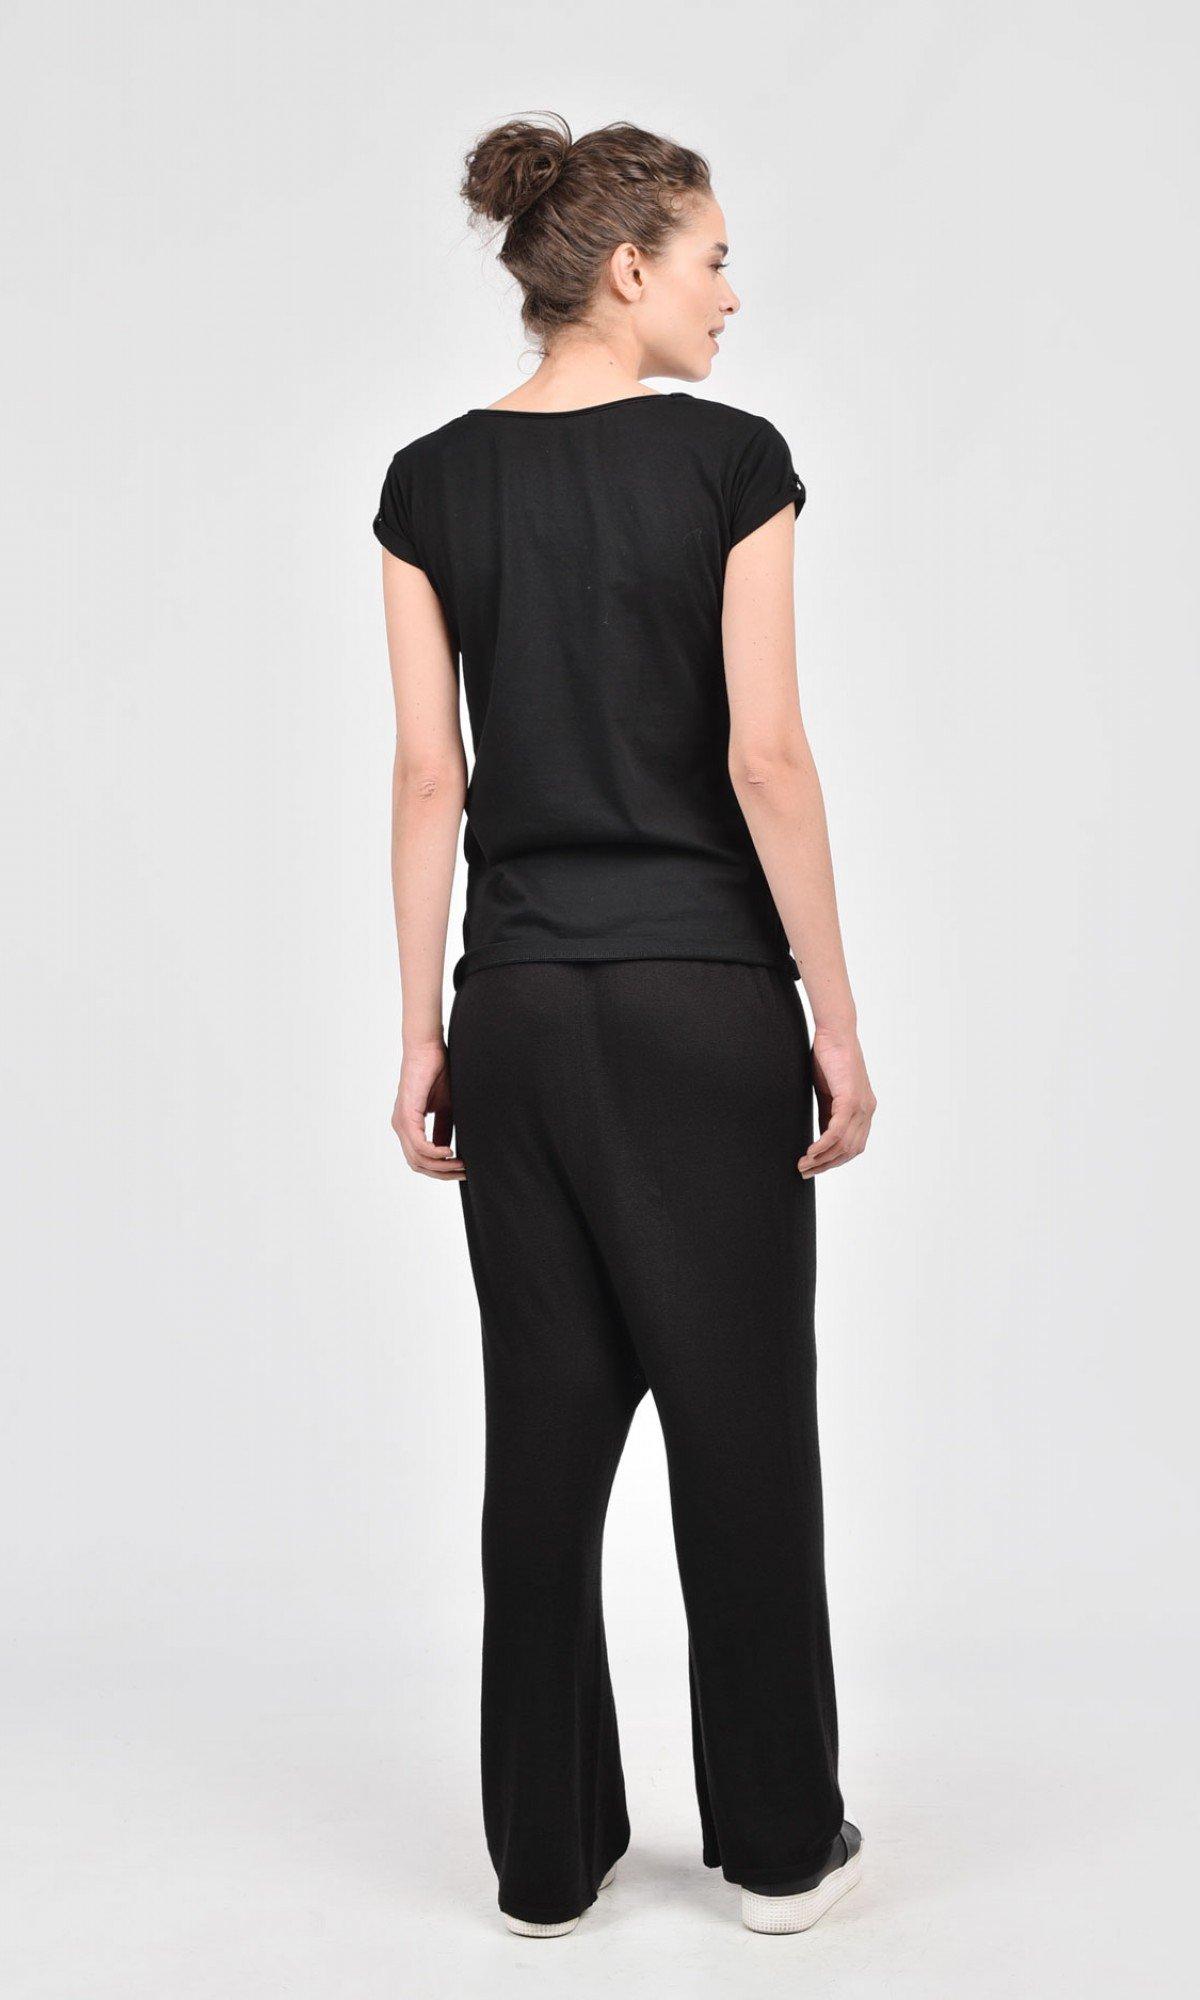 Loose Black Drop Crotch Fully Knit Pants A05321